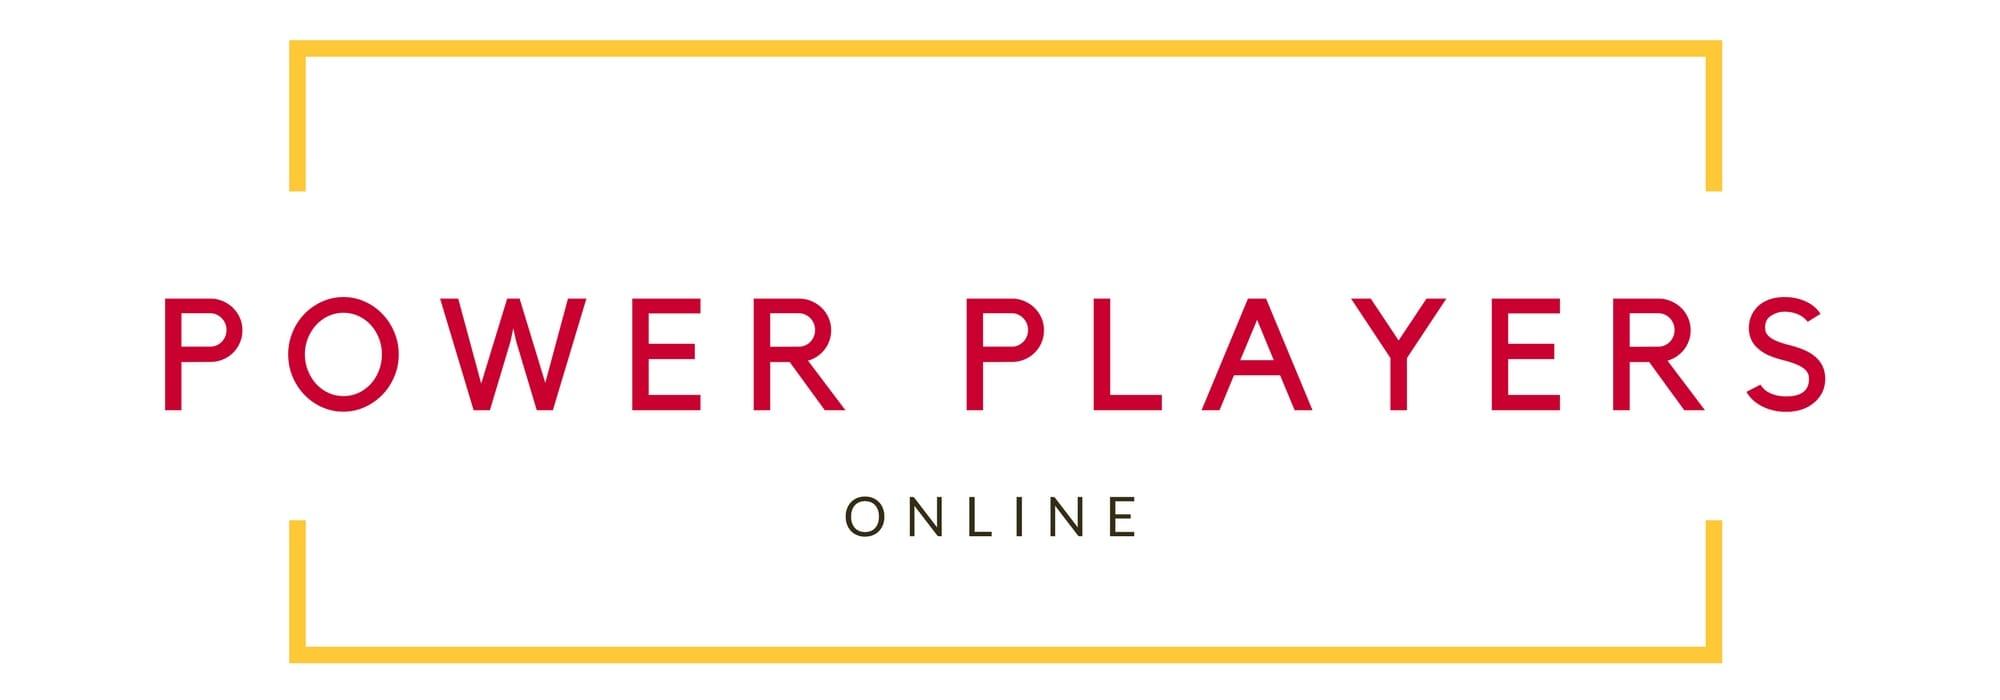 Power-players-online-arancione-tma.jpg